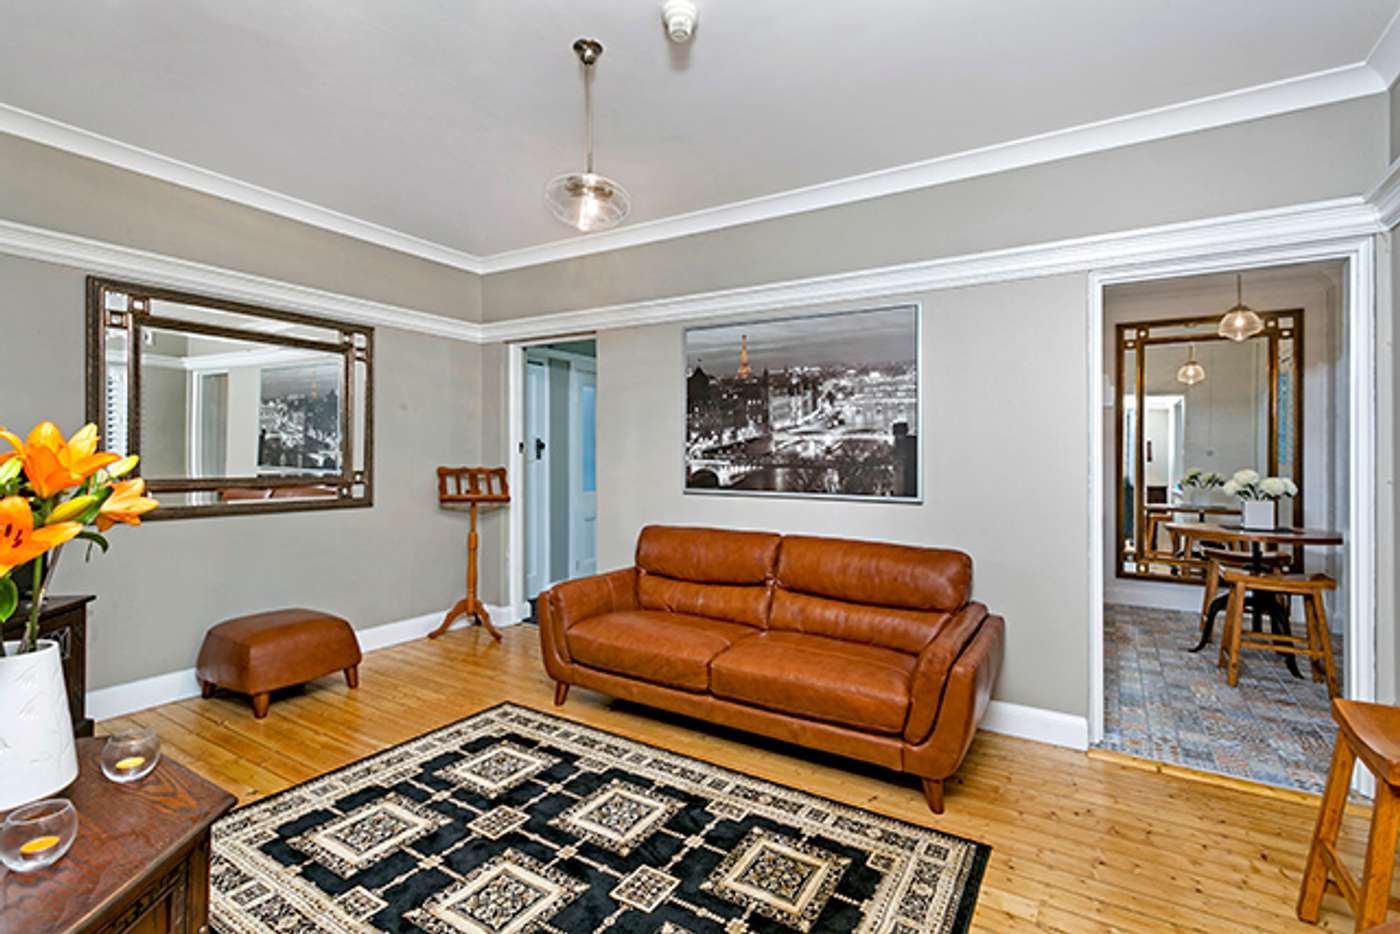 Main view of Homely apartment listing, 1/28 Waruda Street, Kirribilli NSW 2061